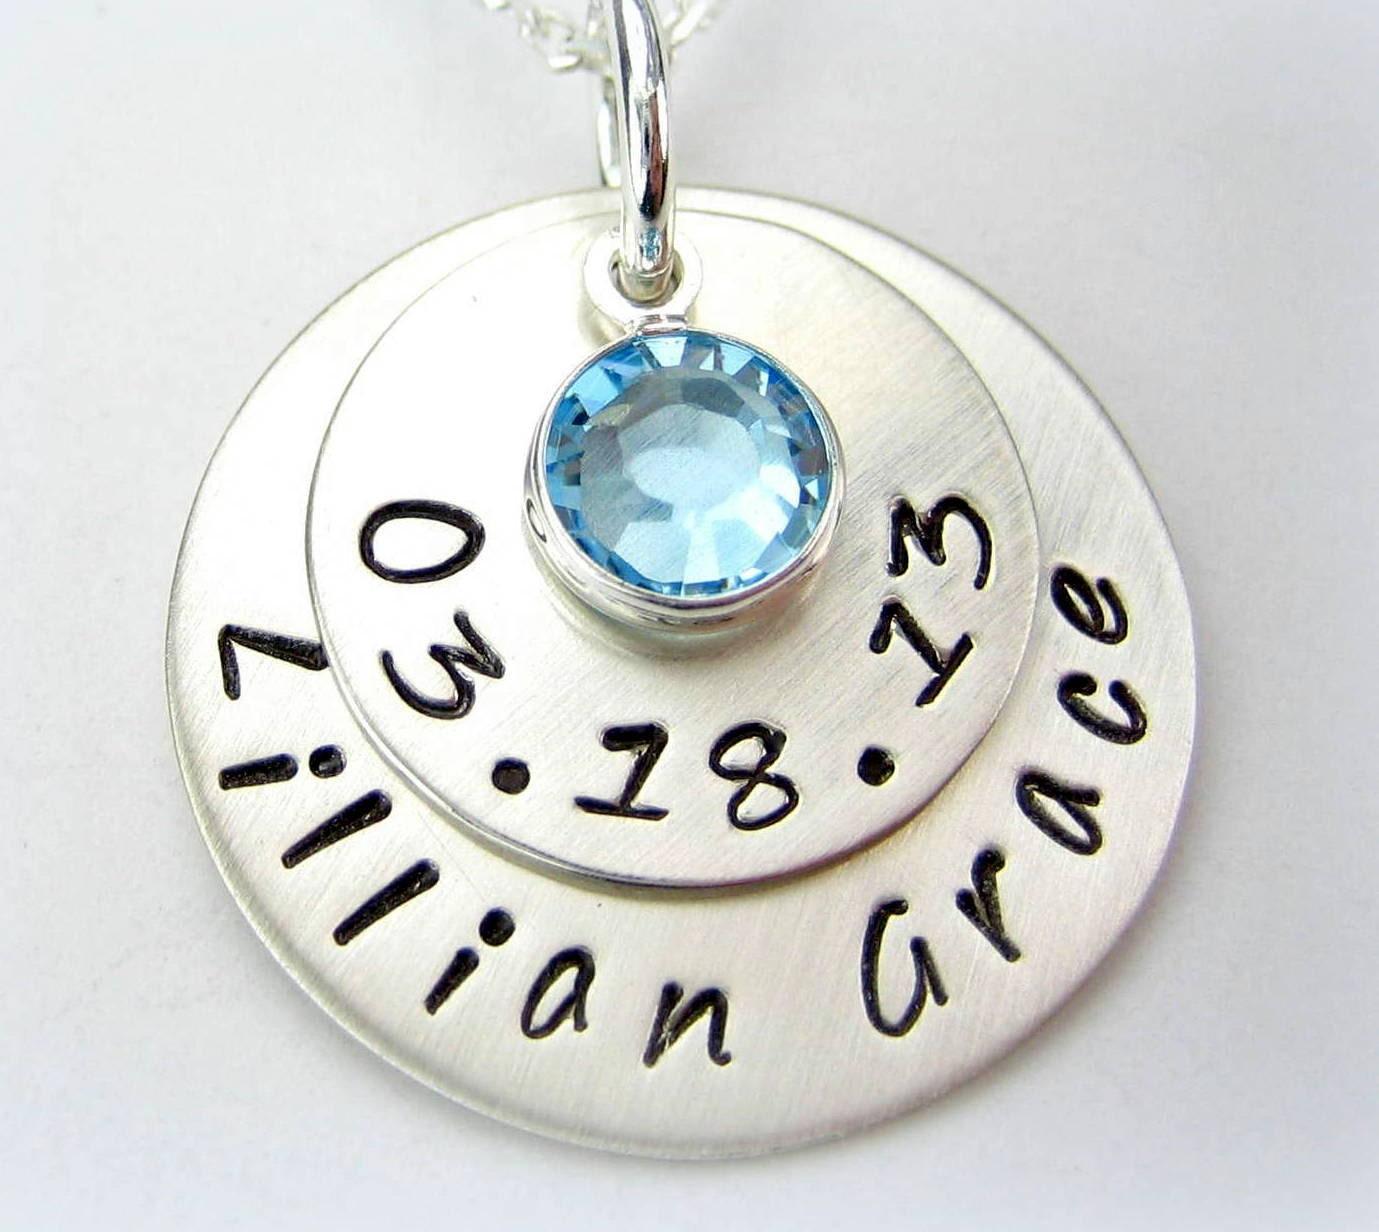 Personalized Mommy Necklace - Sterling Silver Handstamped Baby Newborn Name Necklace Swarovski birthstone